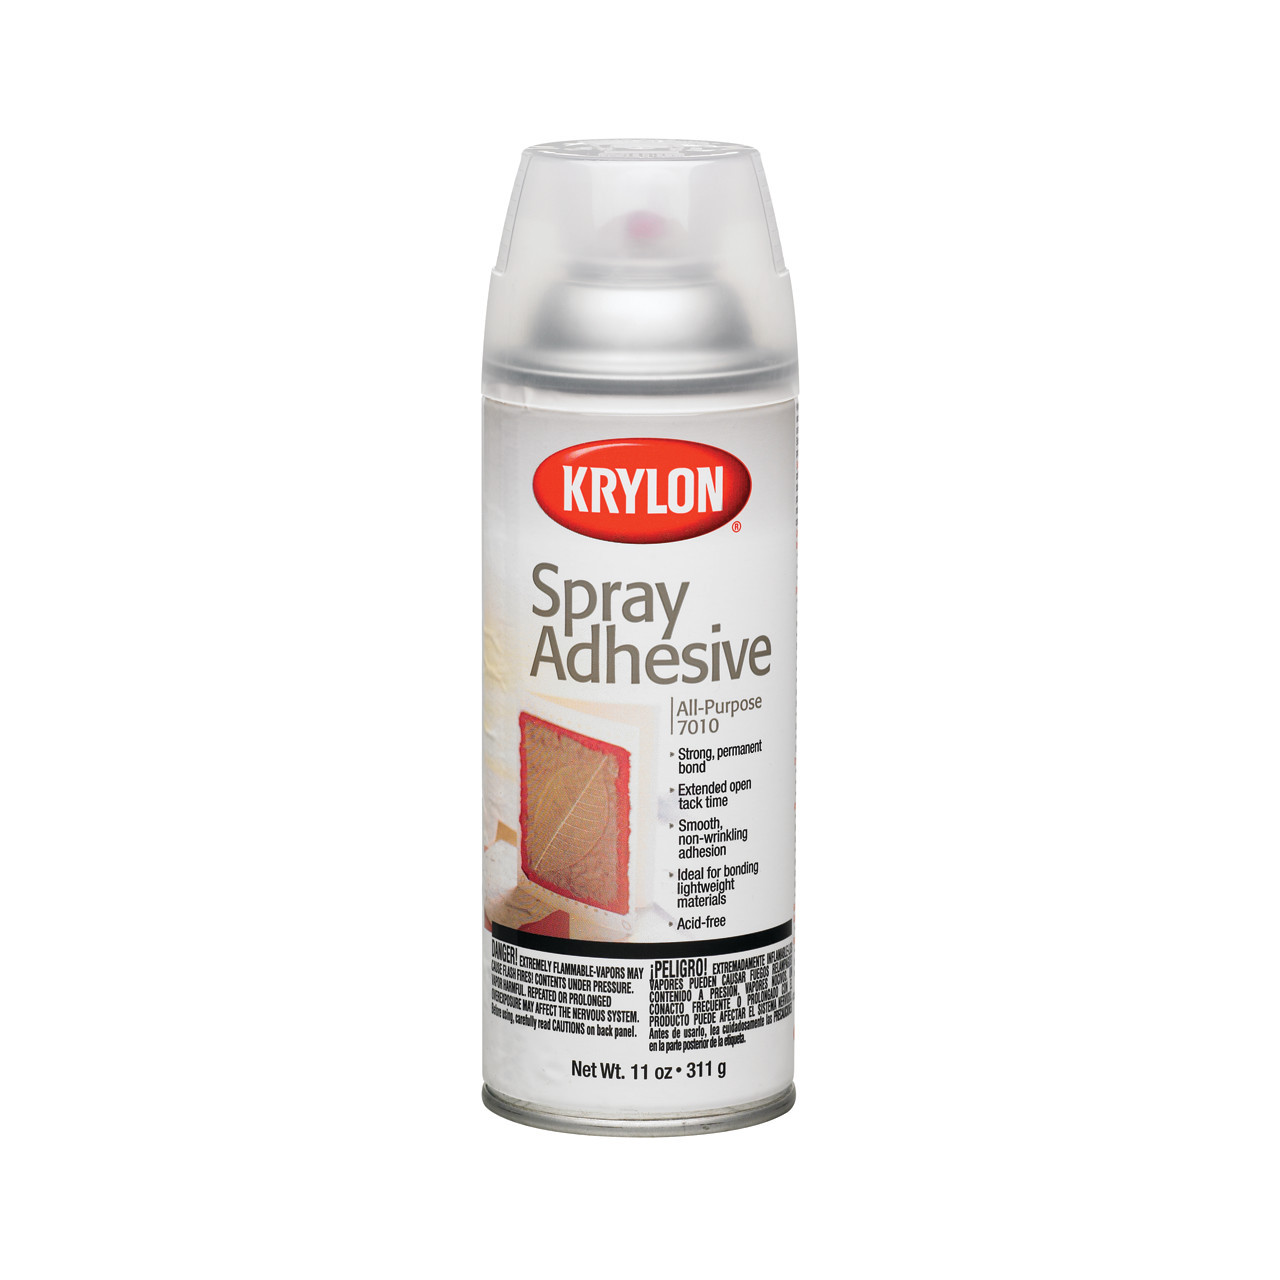 Krylon Clear Spray Adhesive